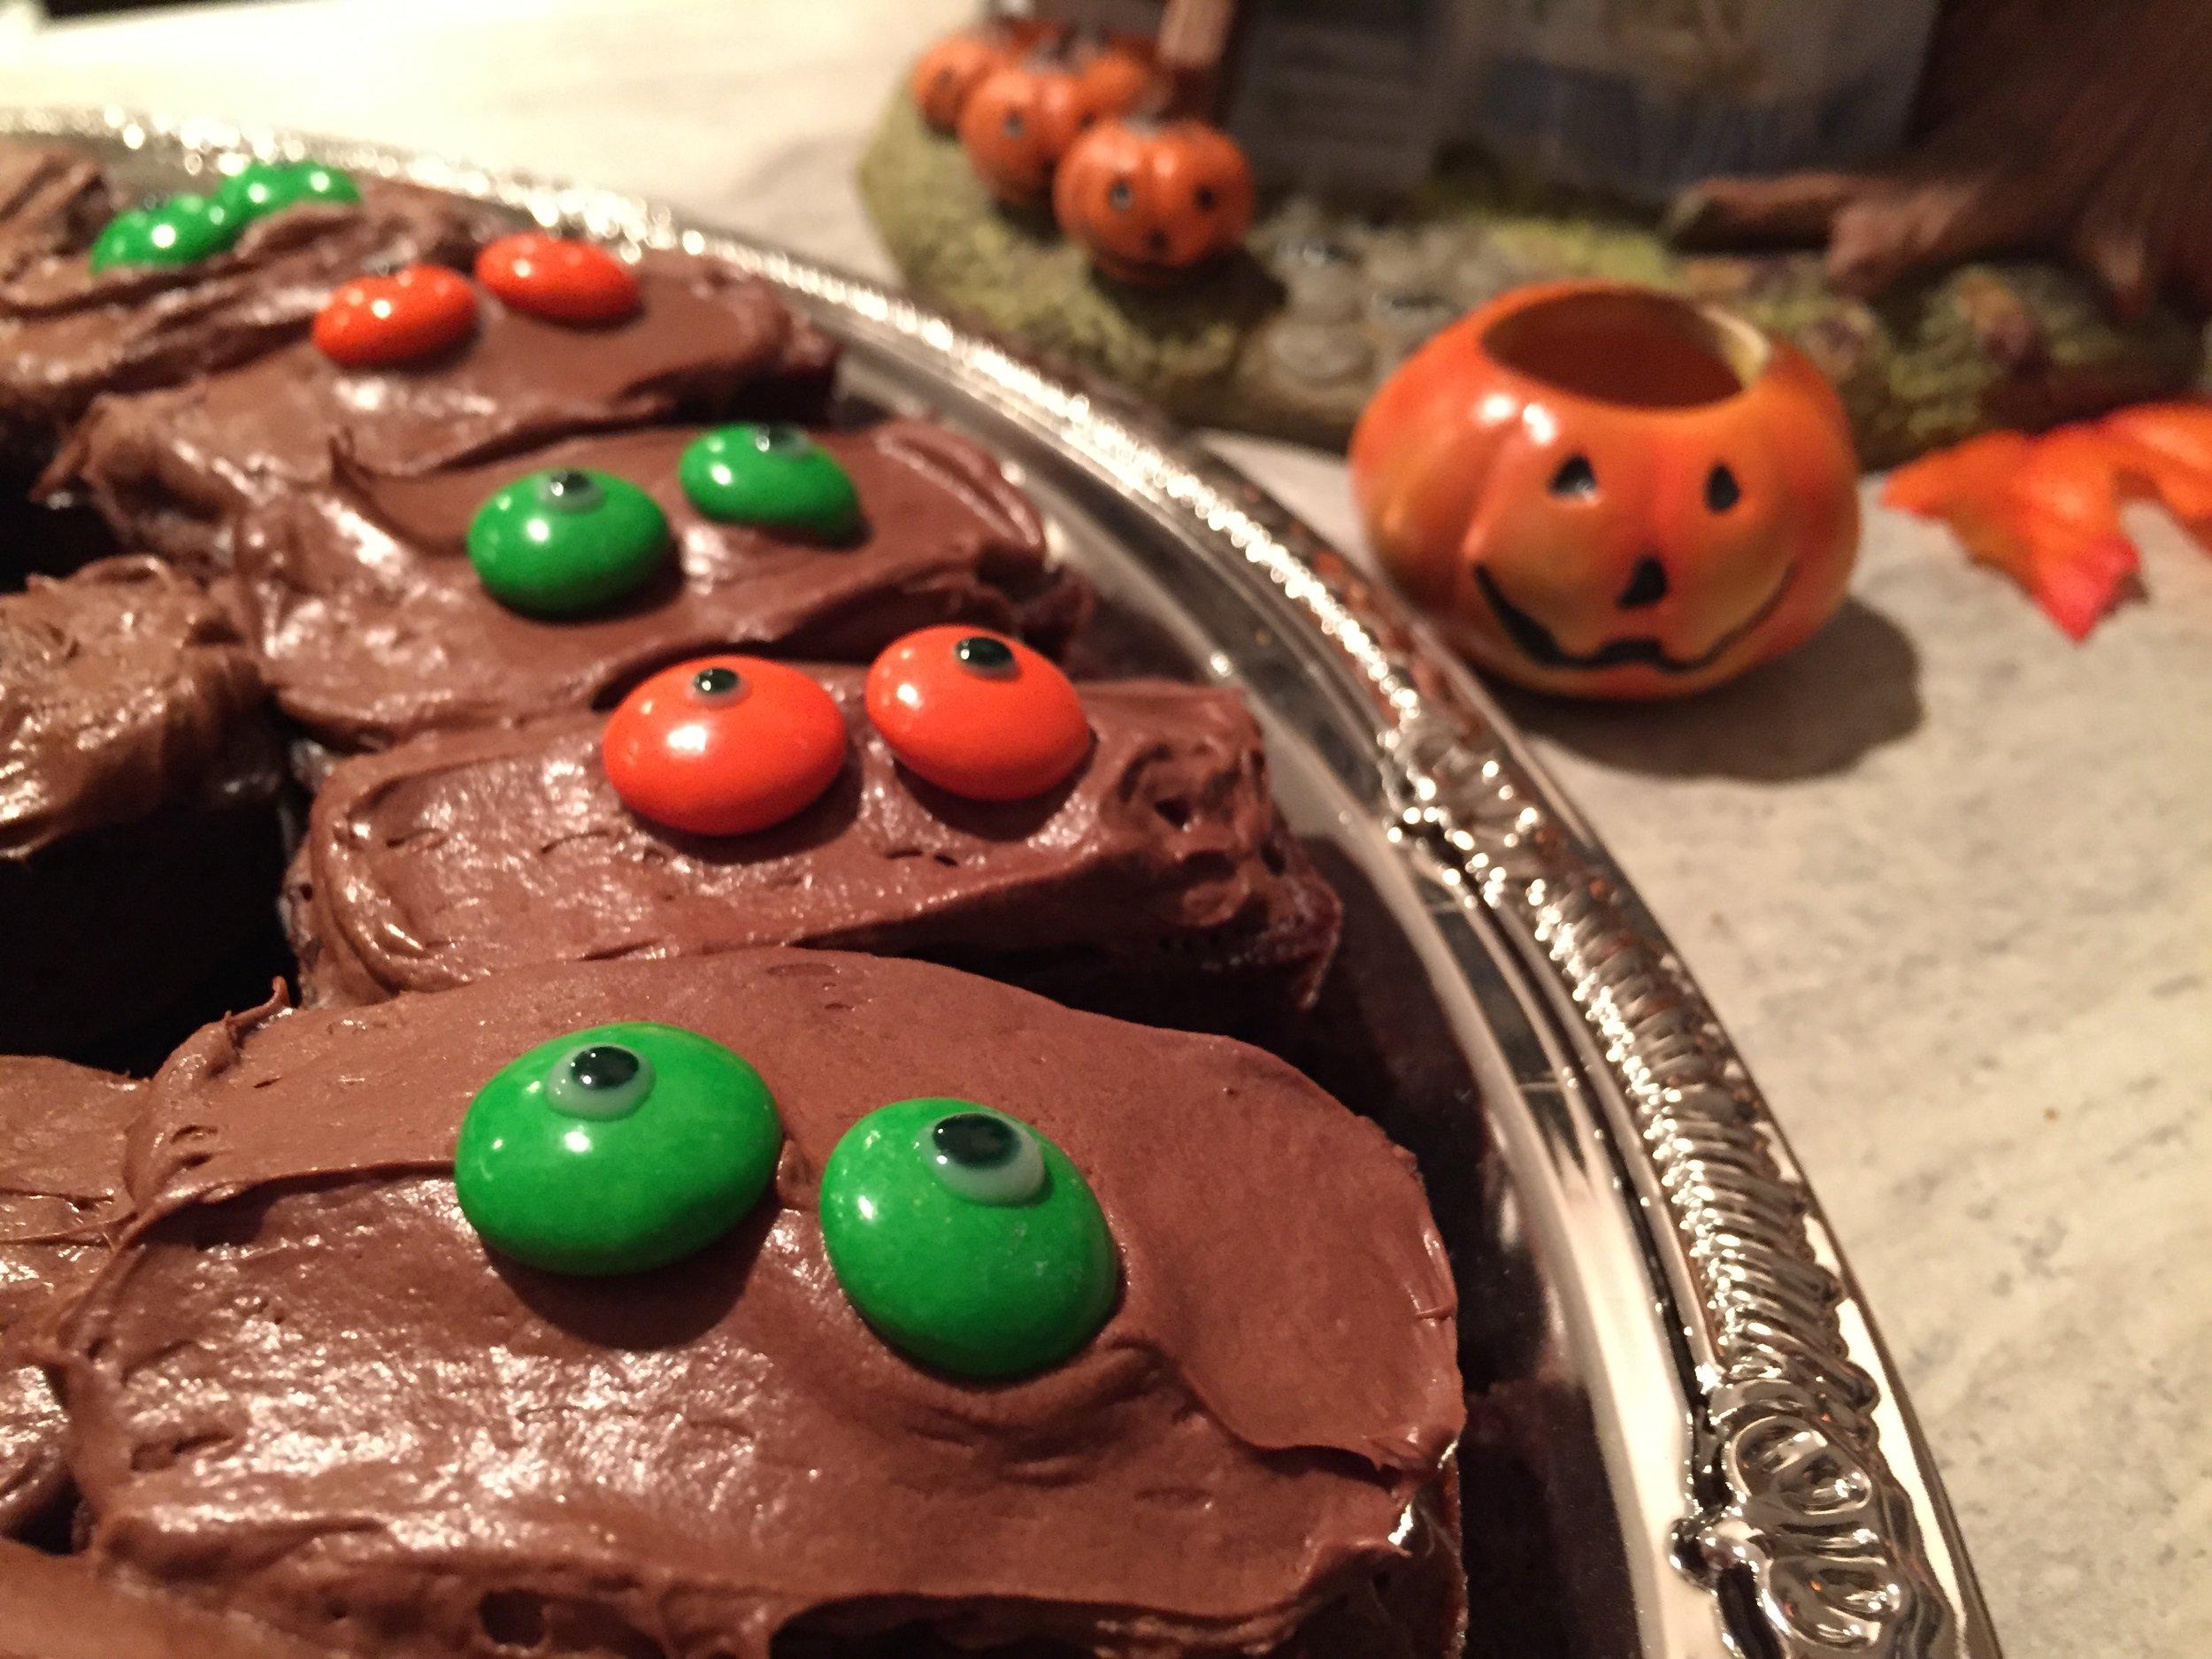 October Favorites, Monthly Favorites, Fall Favorites, Fall, Fall Leaves, Halloween, Baking, Epicure, Pinterest, Kiehl's, Kiehl's Eye Treatment, Outlander Series, Outlander Season 1, Ipsy, Scarves, Fashion Accessories,